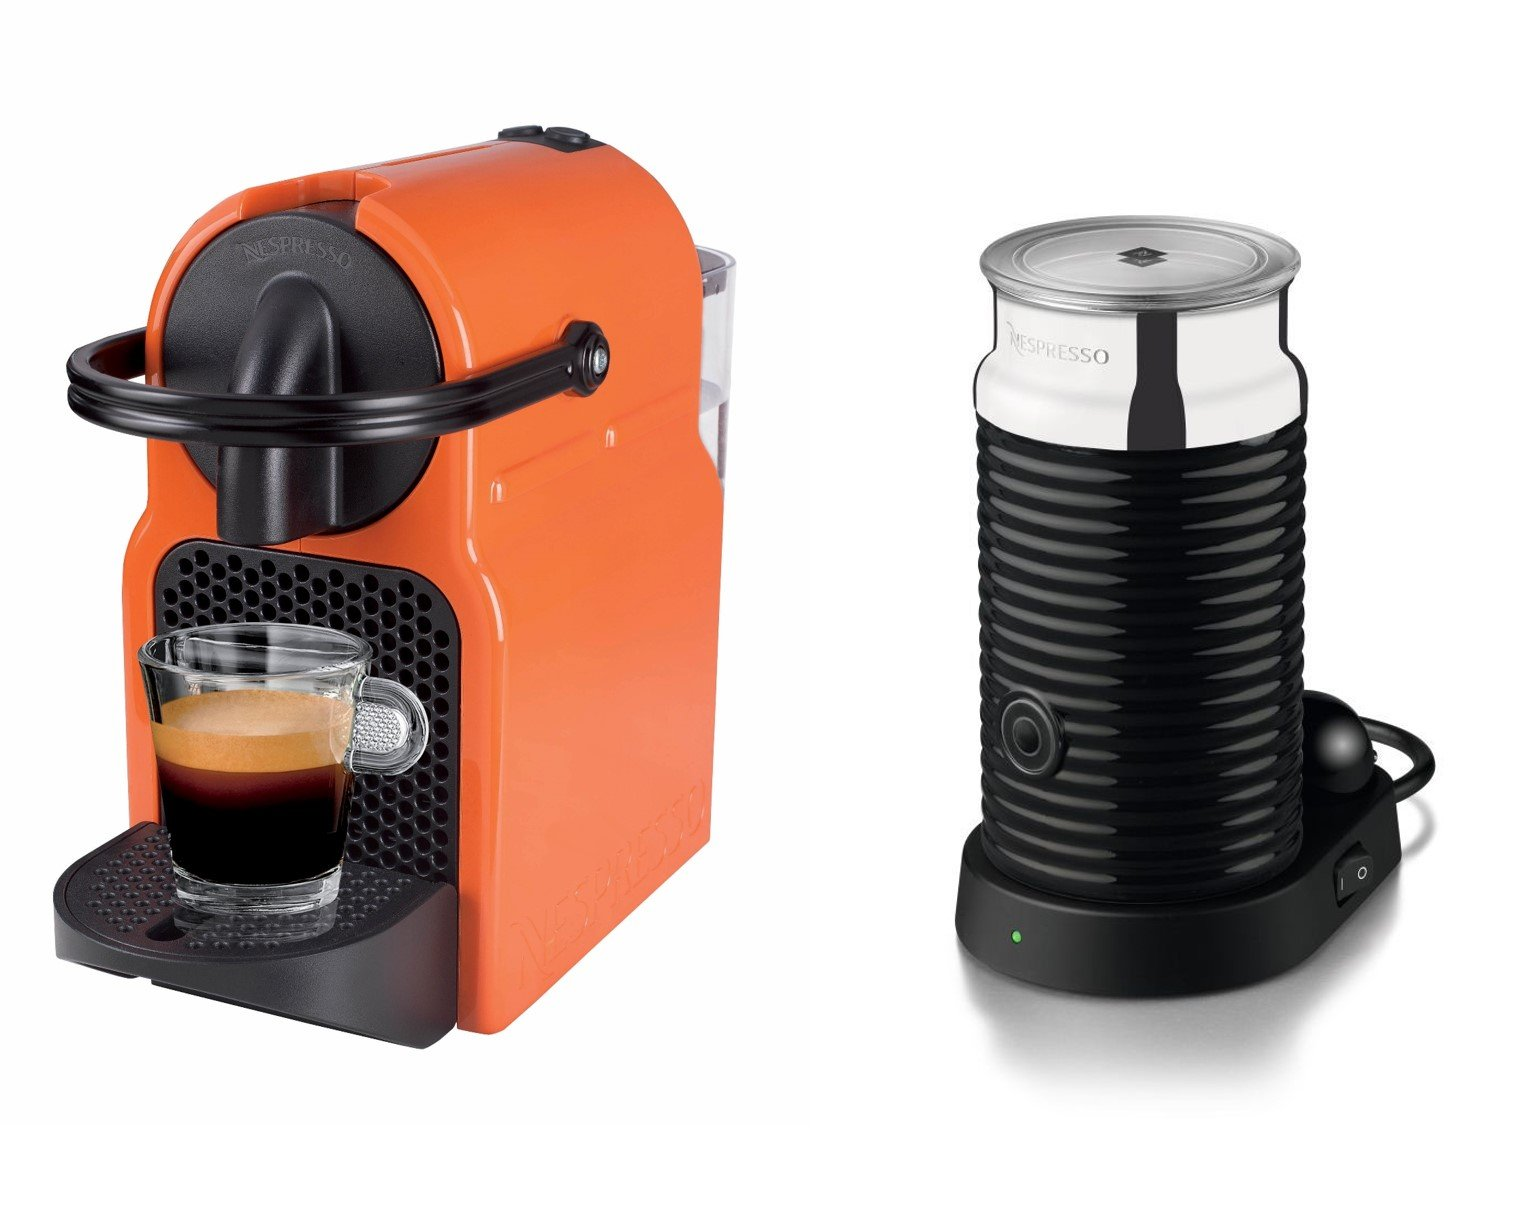 magimix nespresso inissia summer sun and aeroccino coffee. Black Bedroom Furniture Sets. Home Design Ideas